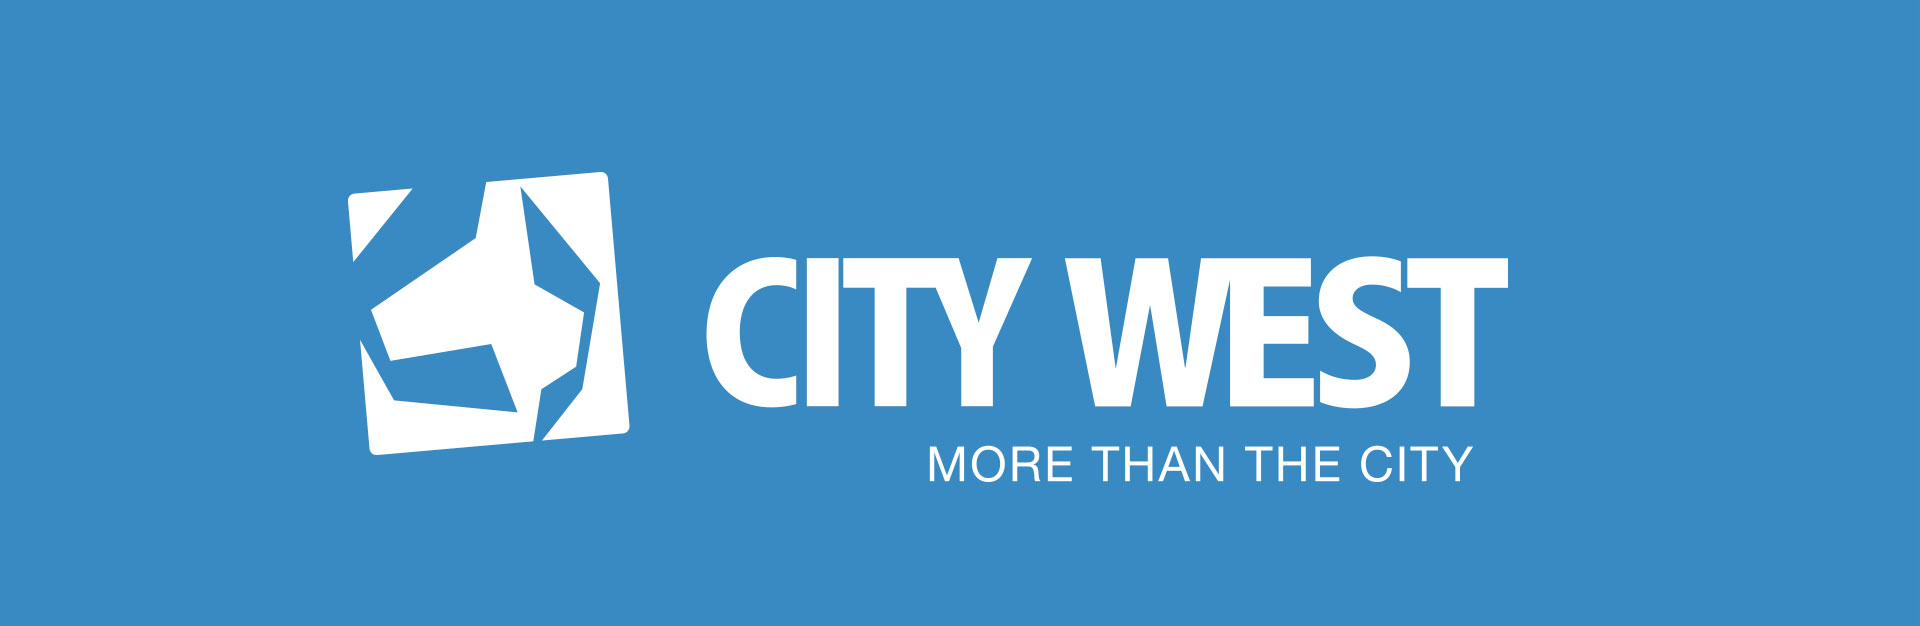 citywest_01